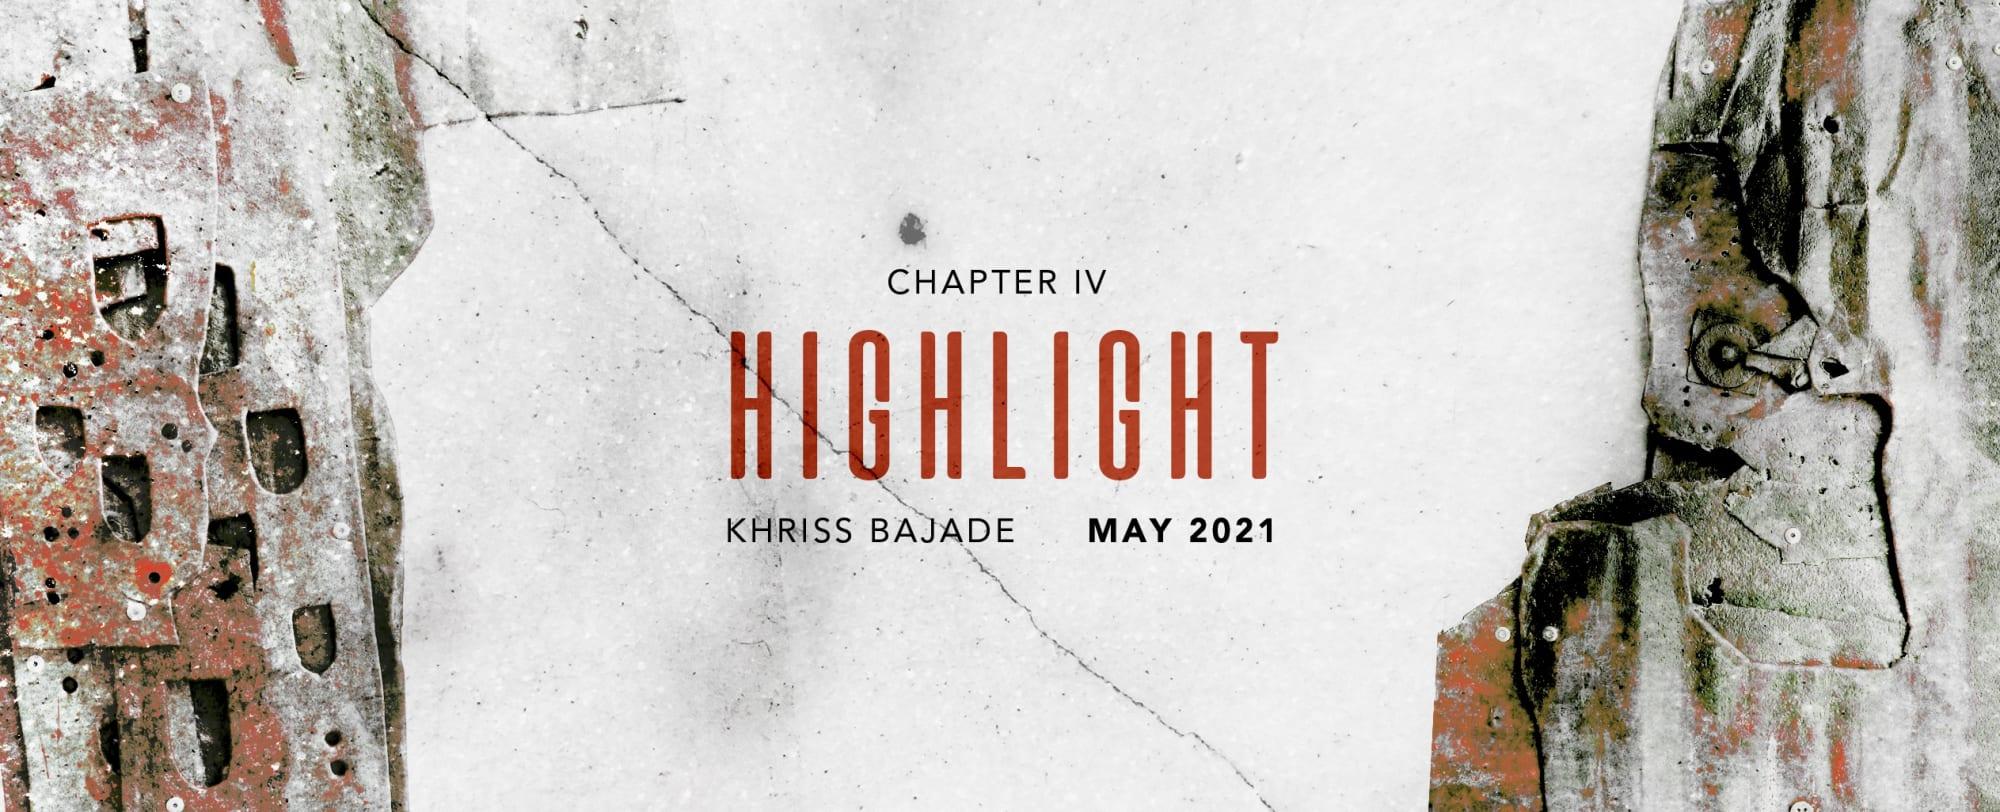 Chapter IV: Highlight